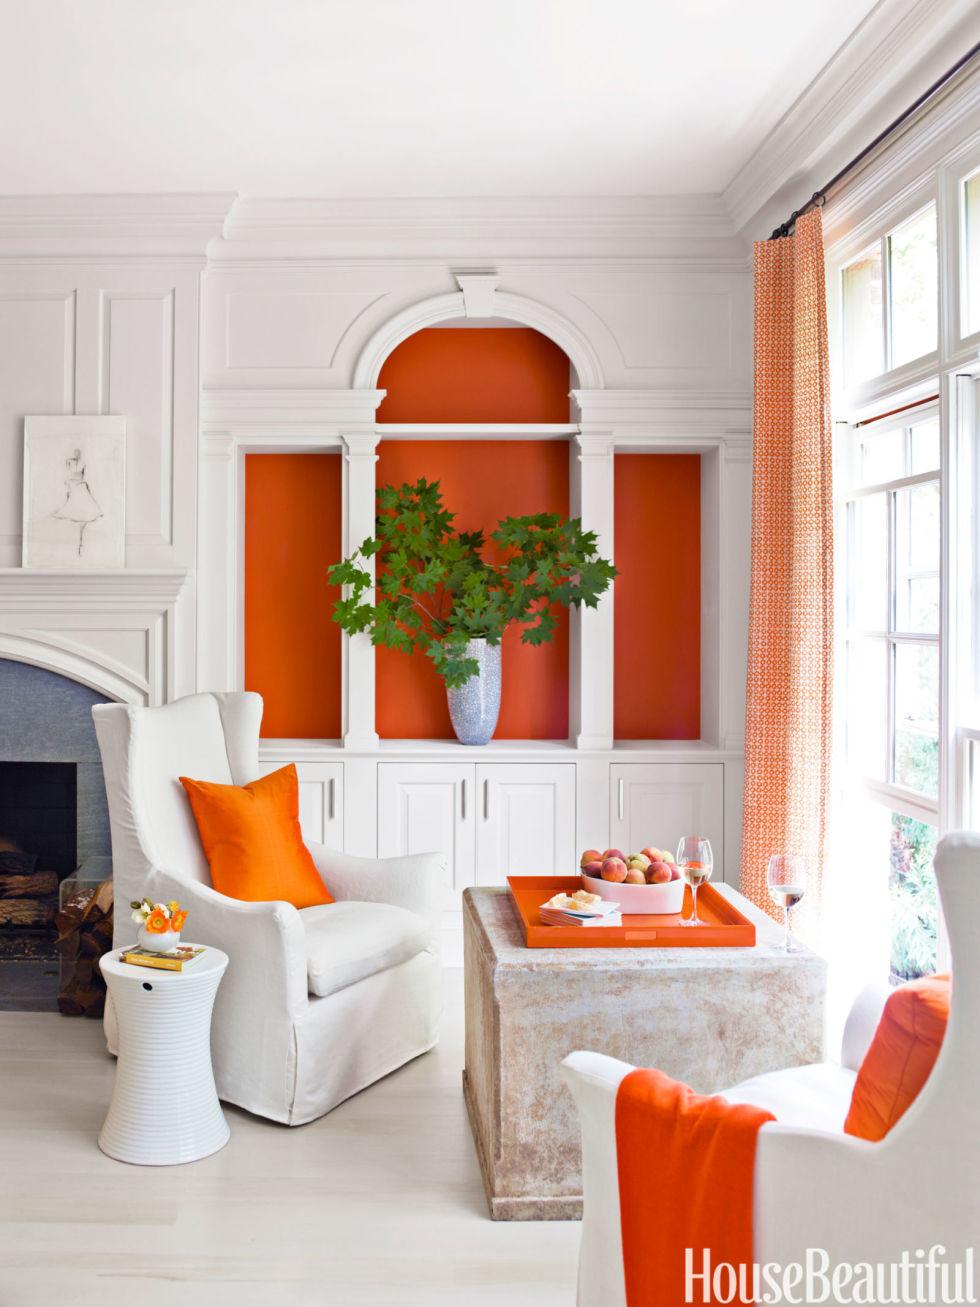 20 easy home decorating ideas - interior decorating and decor tips ECVMVKN